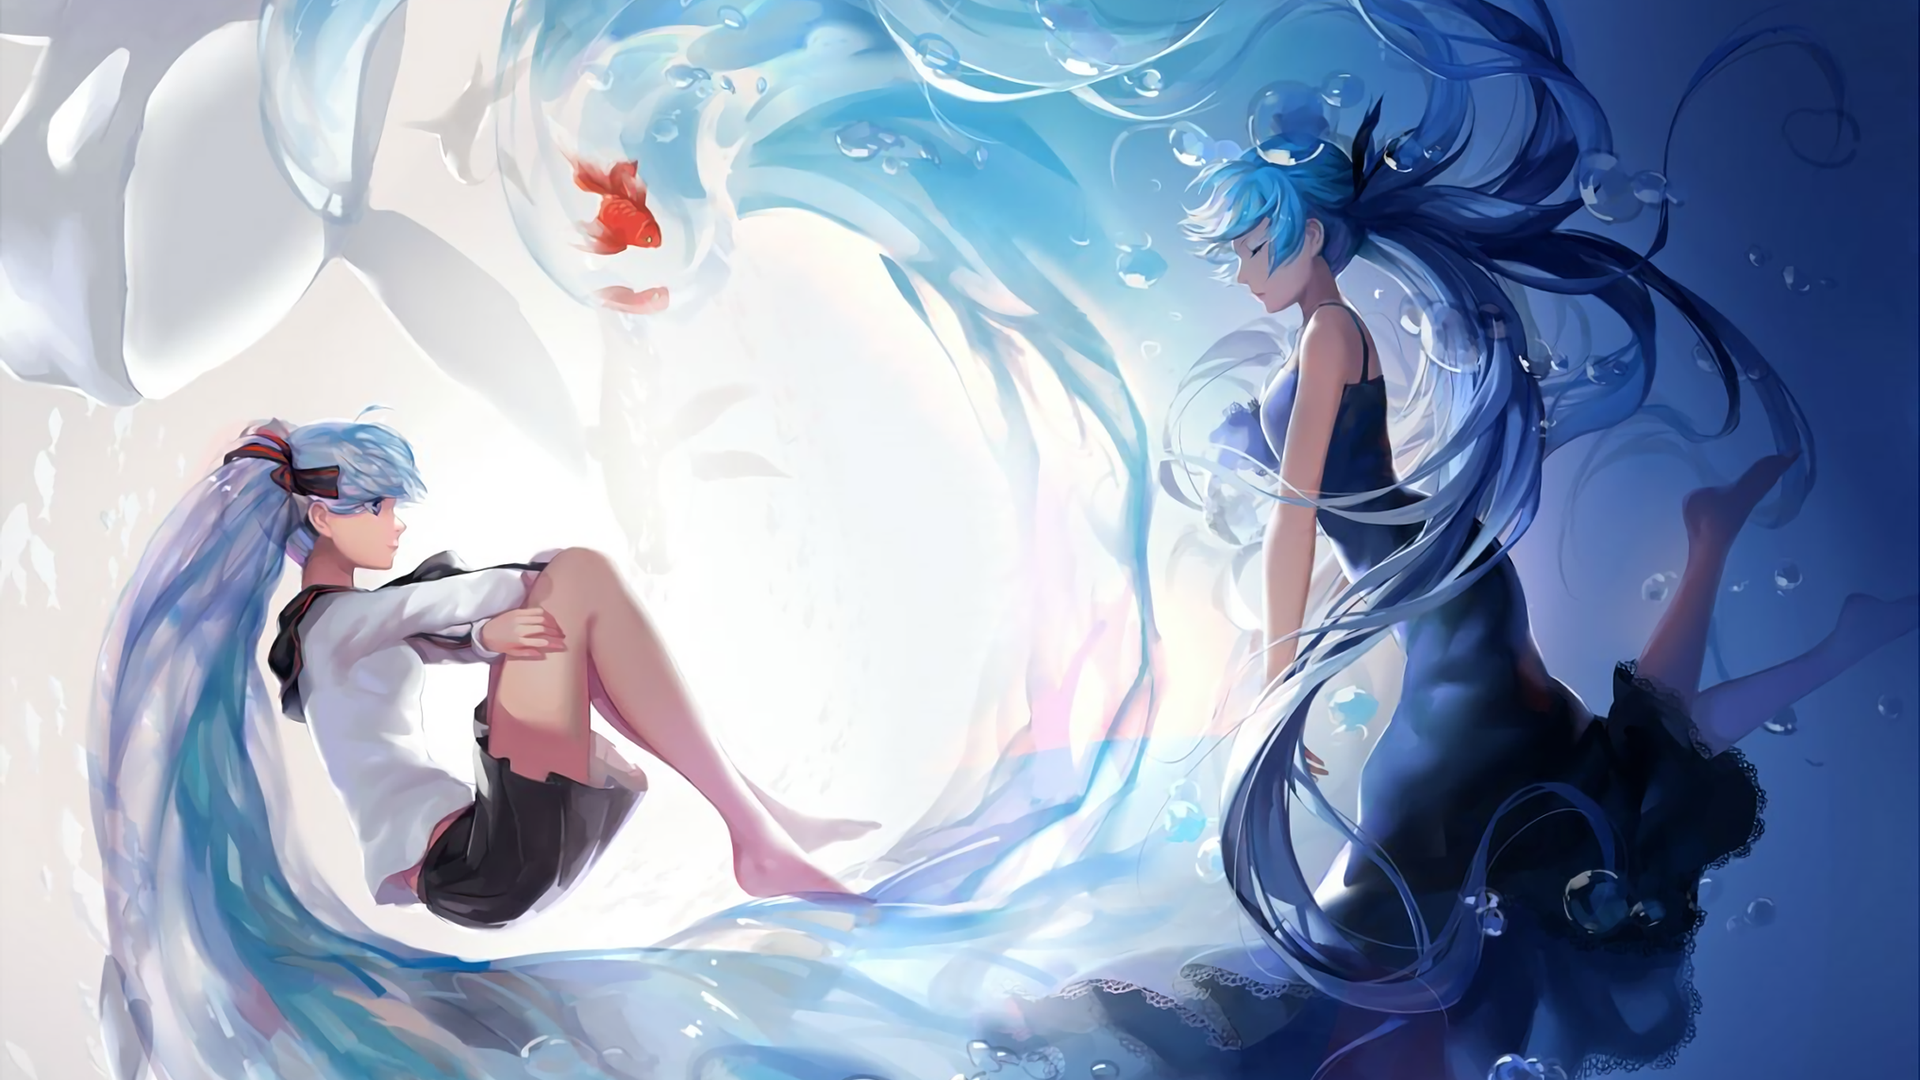 Anime Vocaloid Hatsune Miku Wallpaper anime Vocaloid